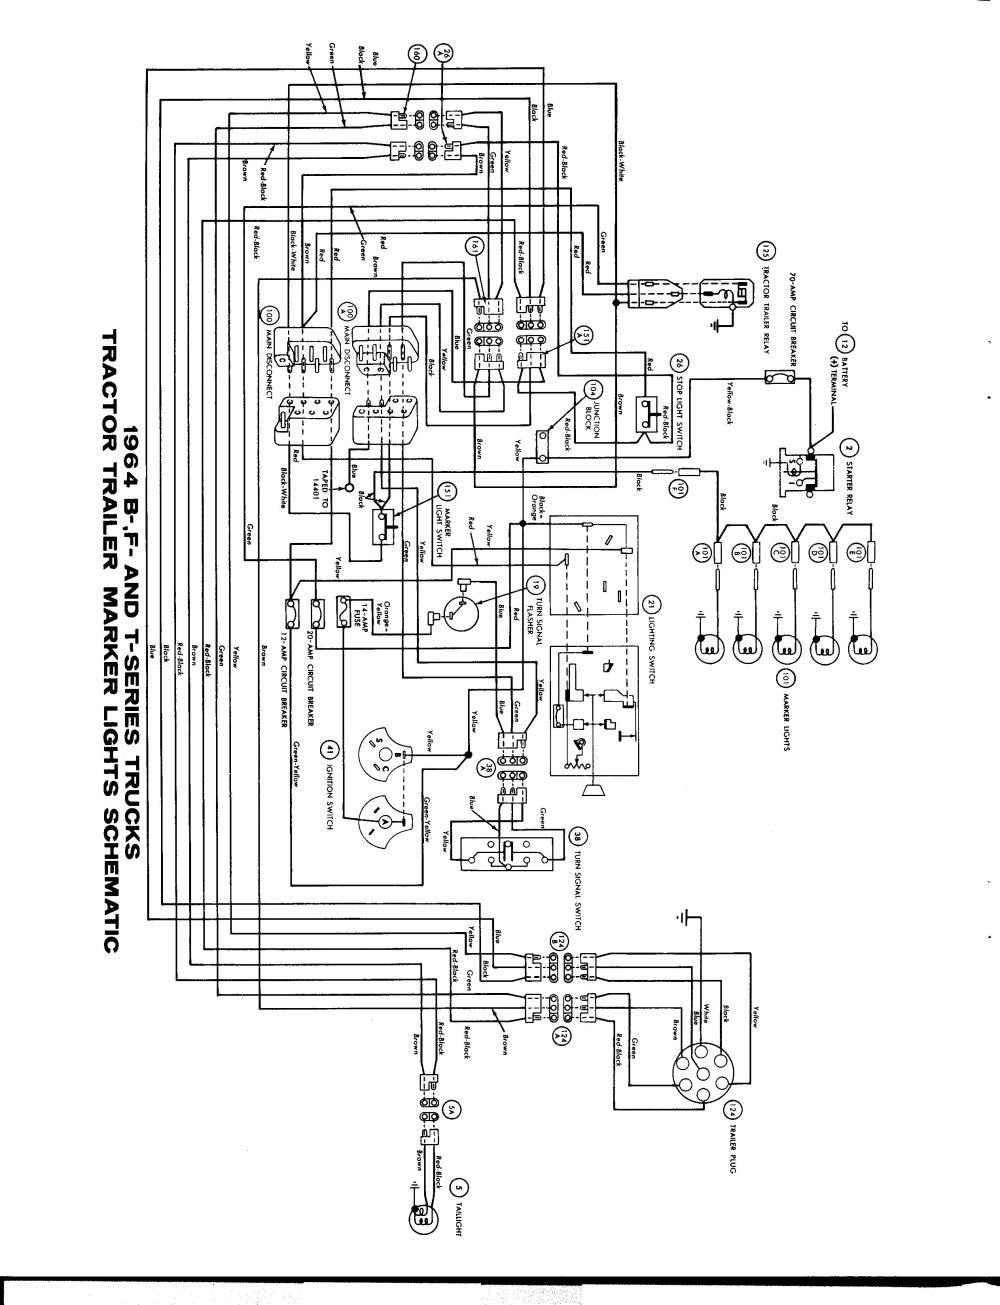 medium resolution of economy power king parts diagram roper wiring diagram economy tractor wiring diagram